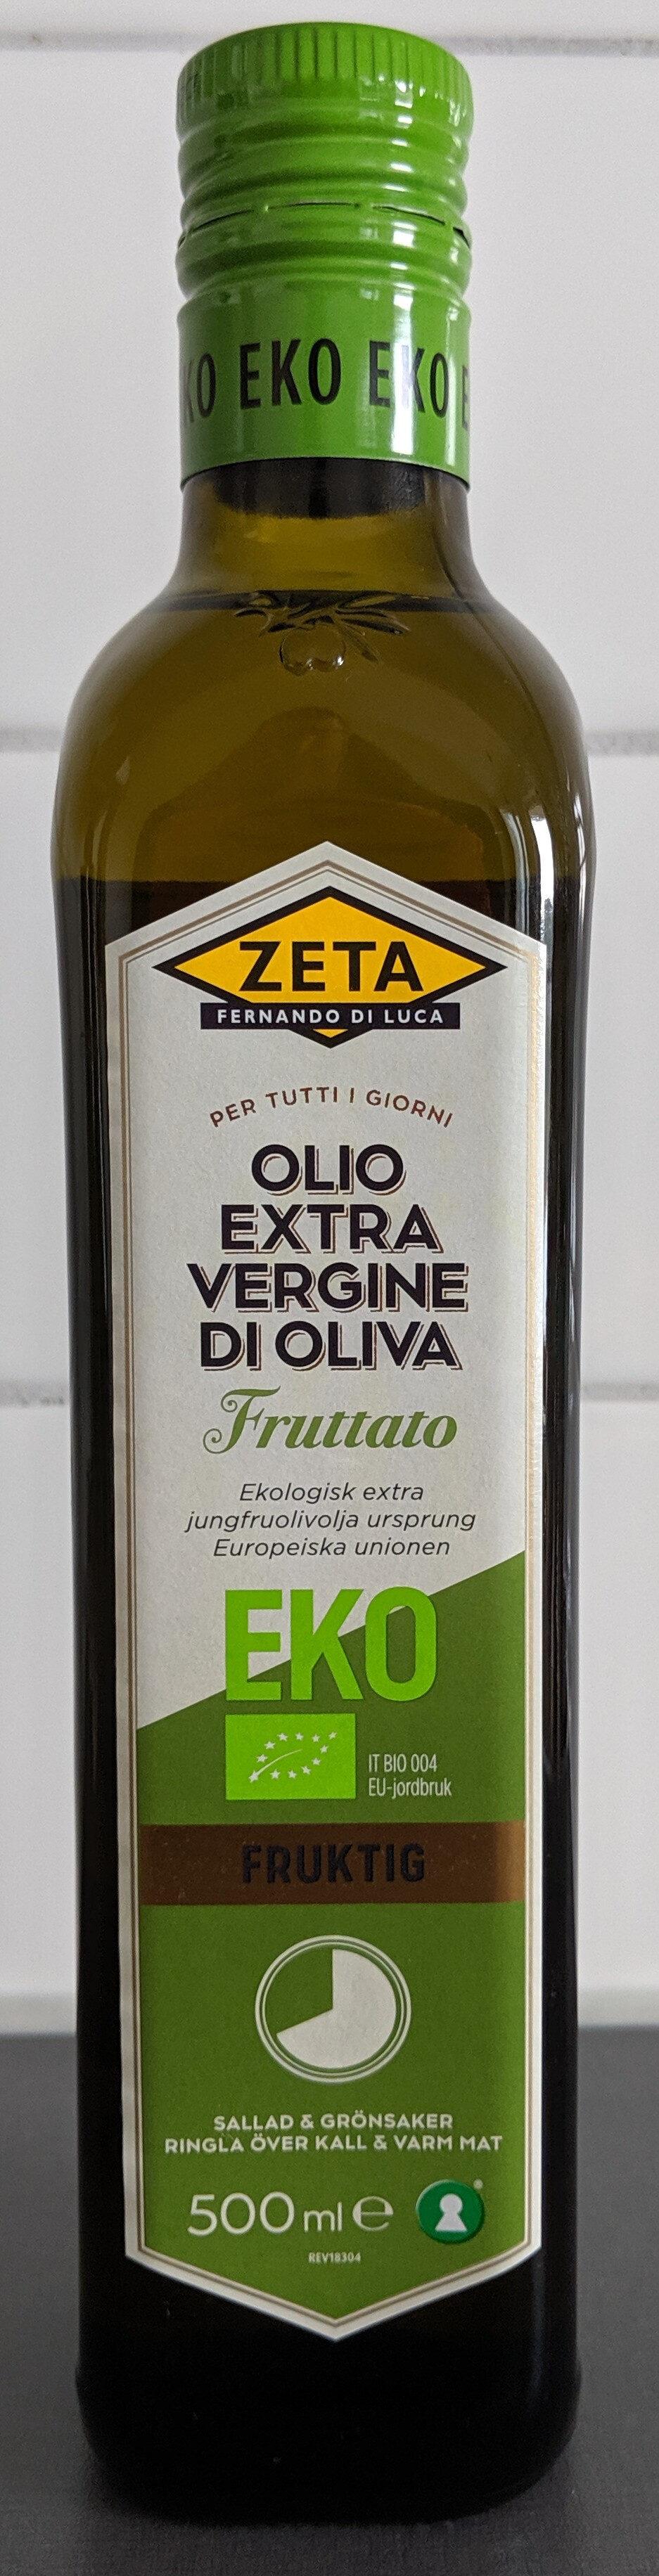 Olio Extra Vergine Do Oliva - Product